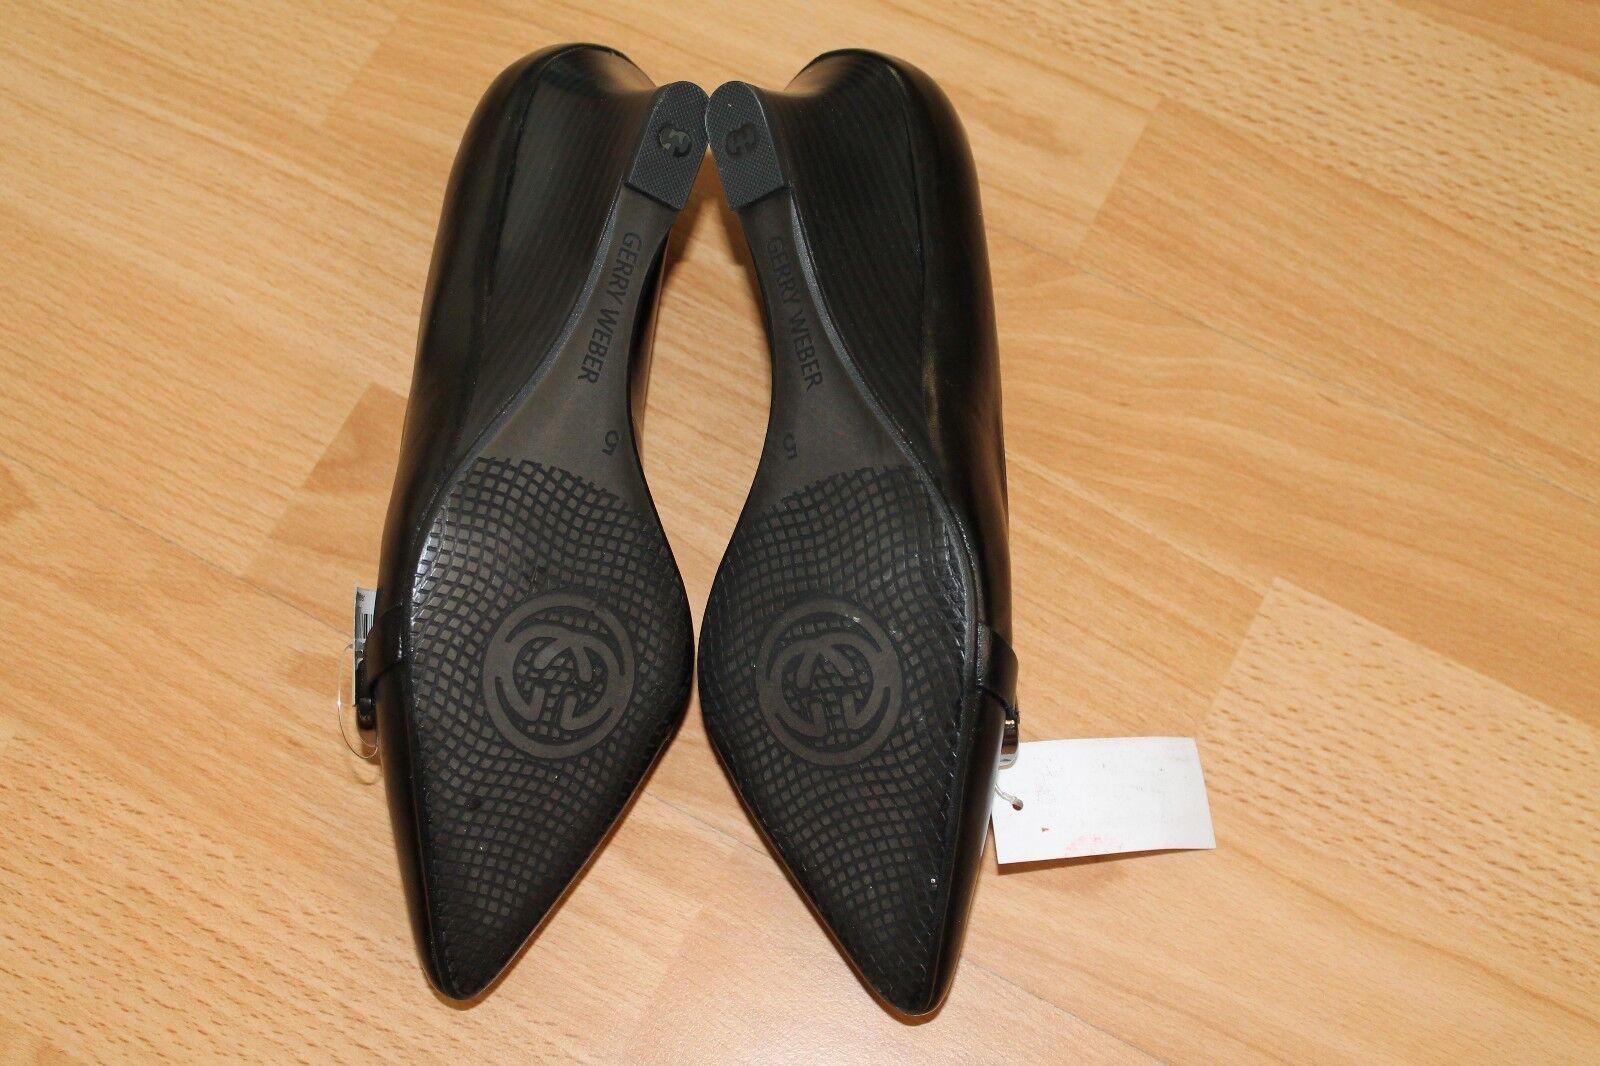 Gerry Weber Damen Schuhe Pumps Größe 38 38 Größe schwarz Echtleder Keilabsatz NEU aee7da